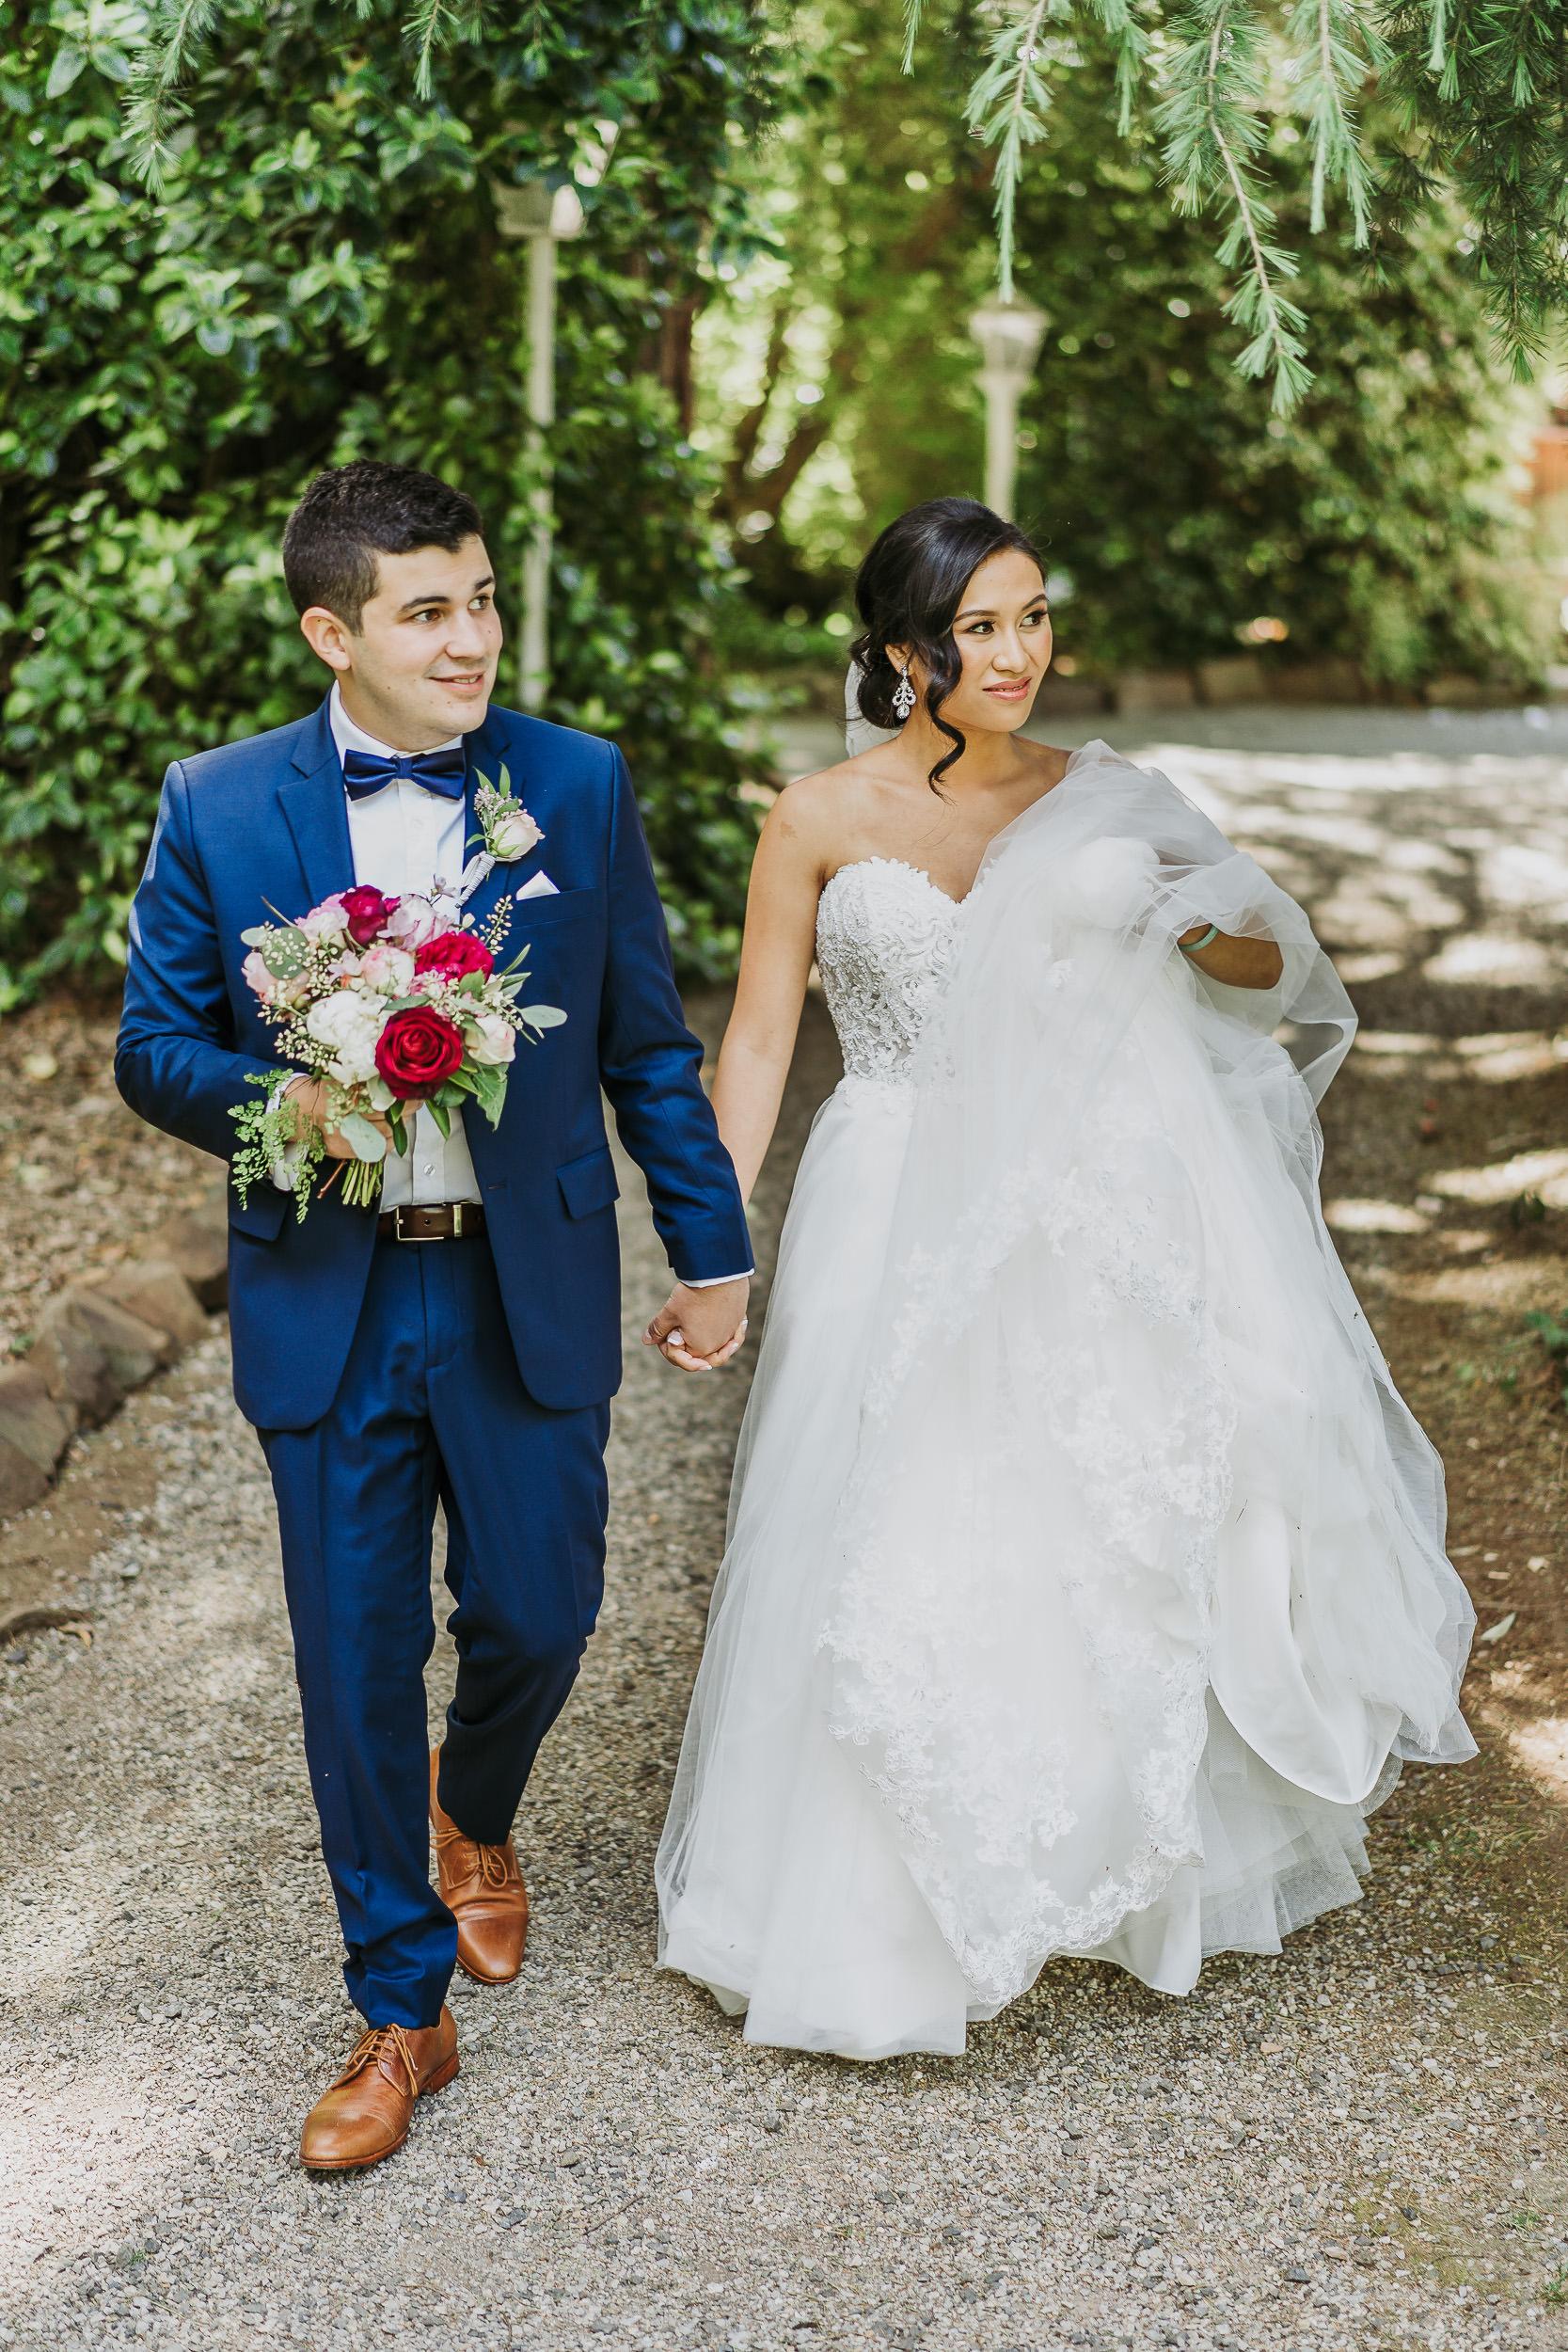 Melbourne-Wedding-Photographer-1004.jpg